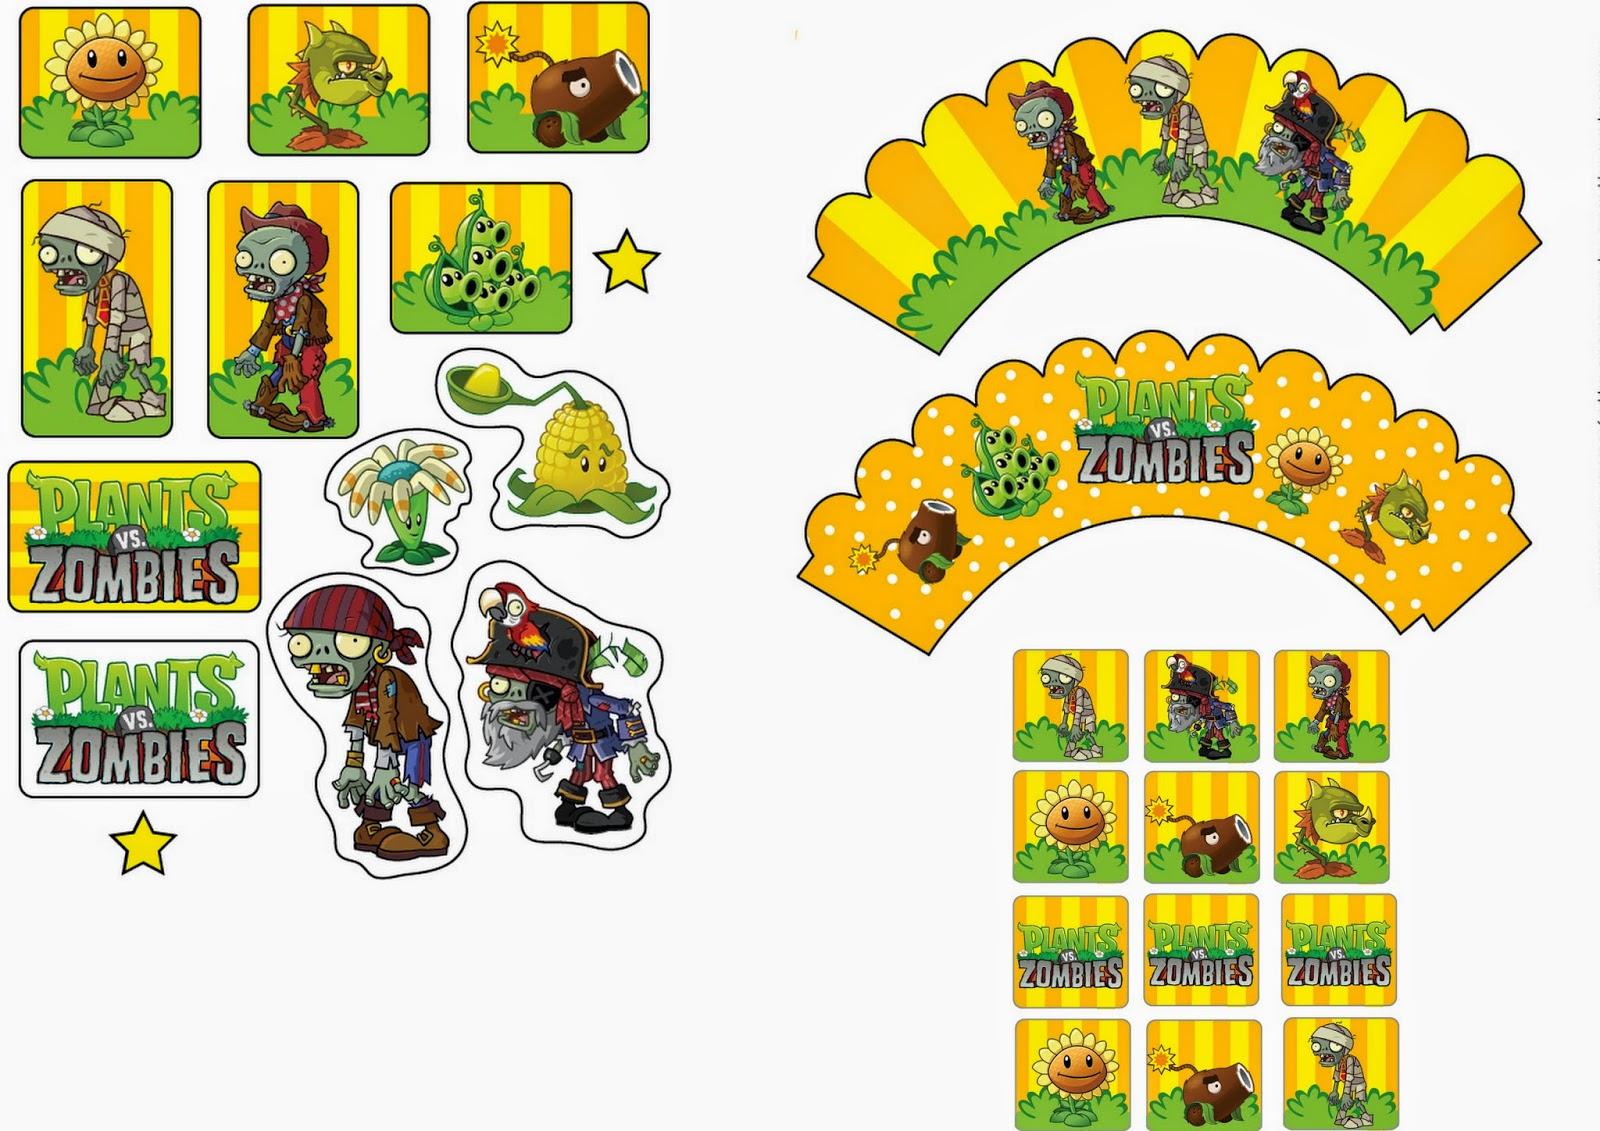 Plants Vs Zombies: Free Printable Cupcake Toppers And Wrappers. | Oh - Free Printable Minecraft Cupcake Toppers And Wrappers